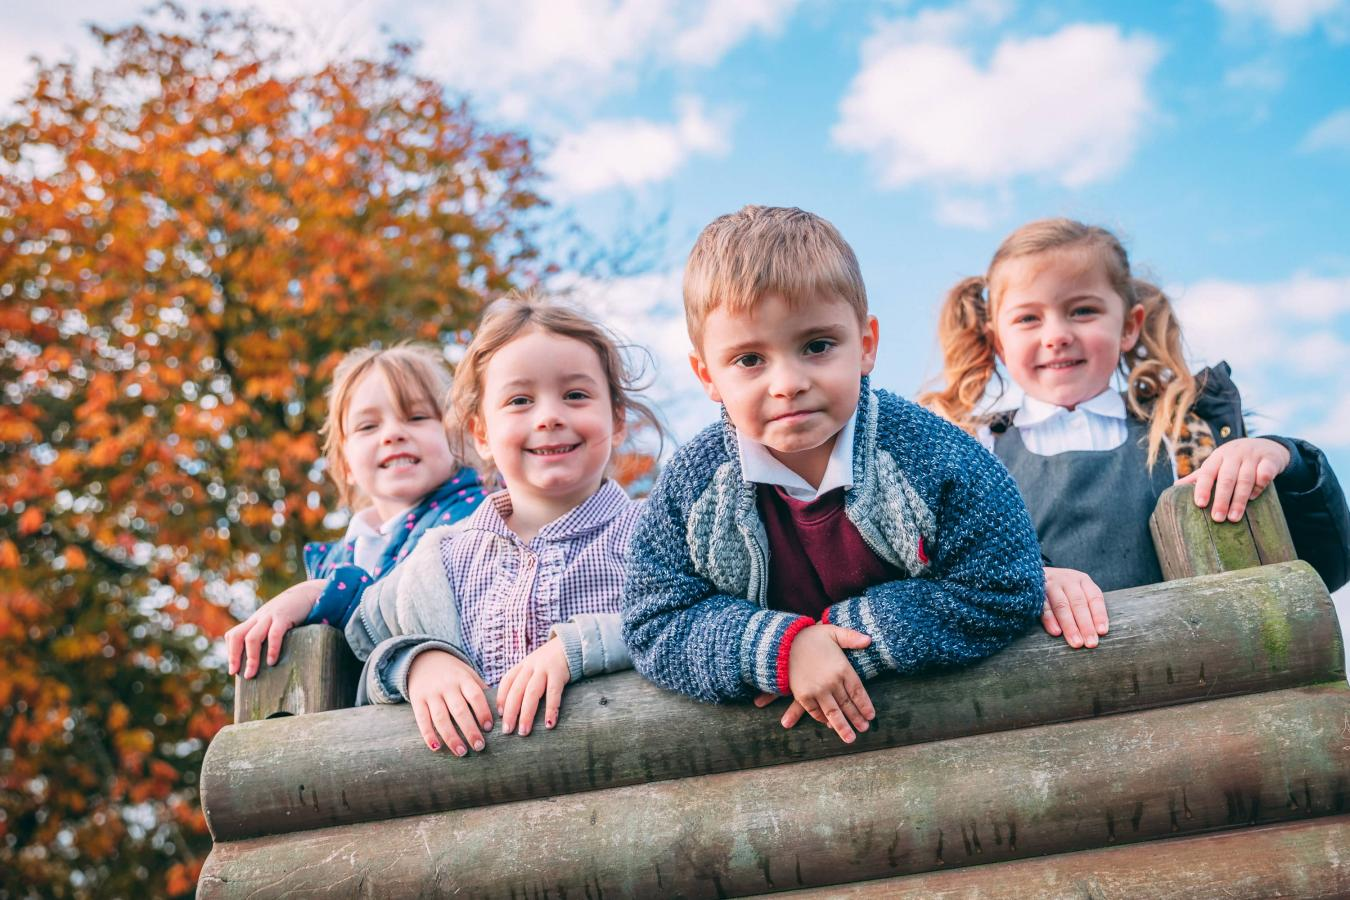 Pupils on a climbing frame